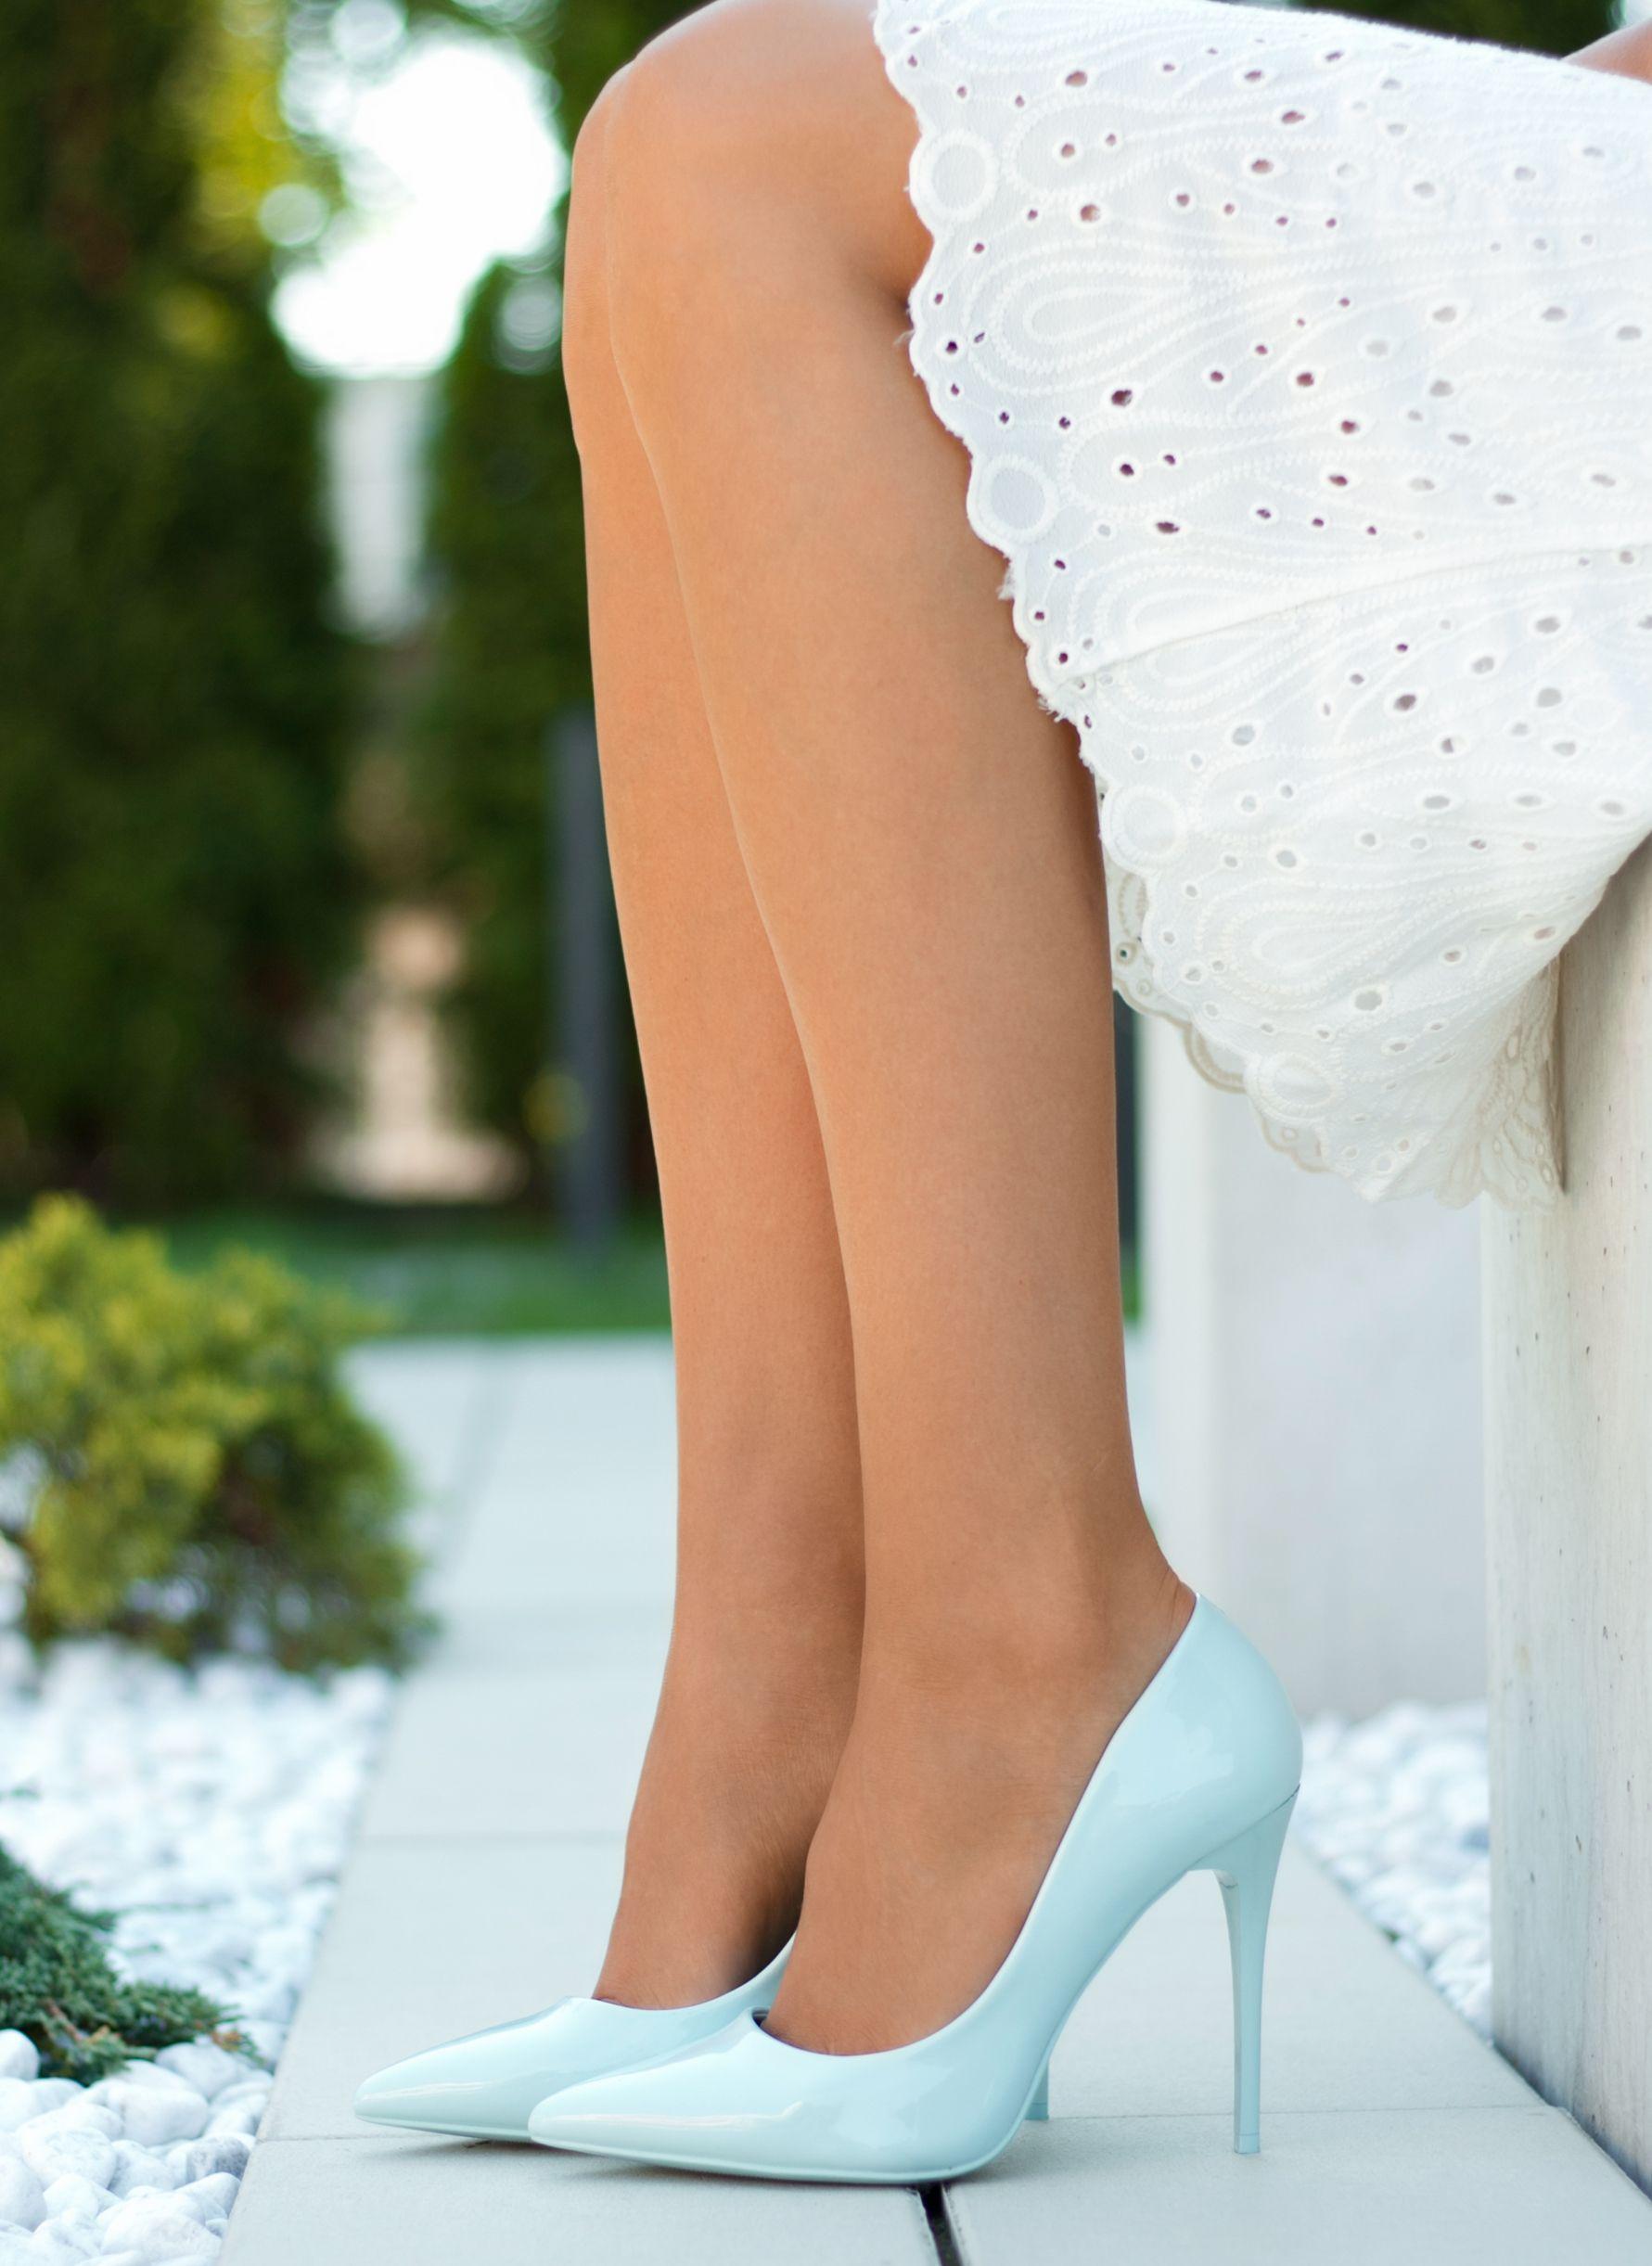 100+ Best Street Style Looks I DeeZee.pl #streetstyle #shoes #fashion #deezee